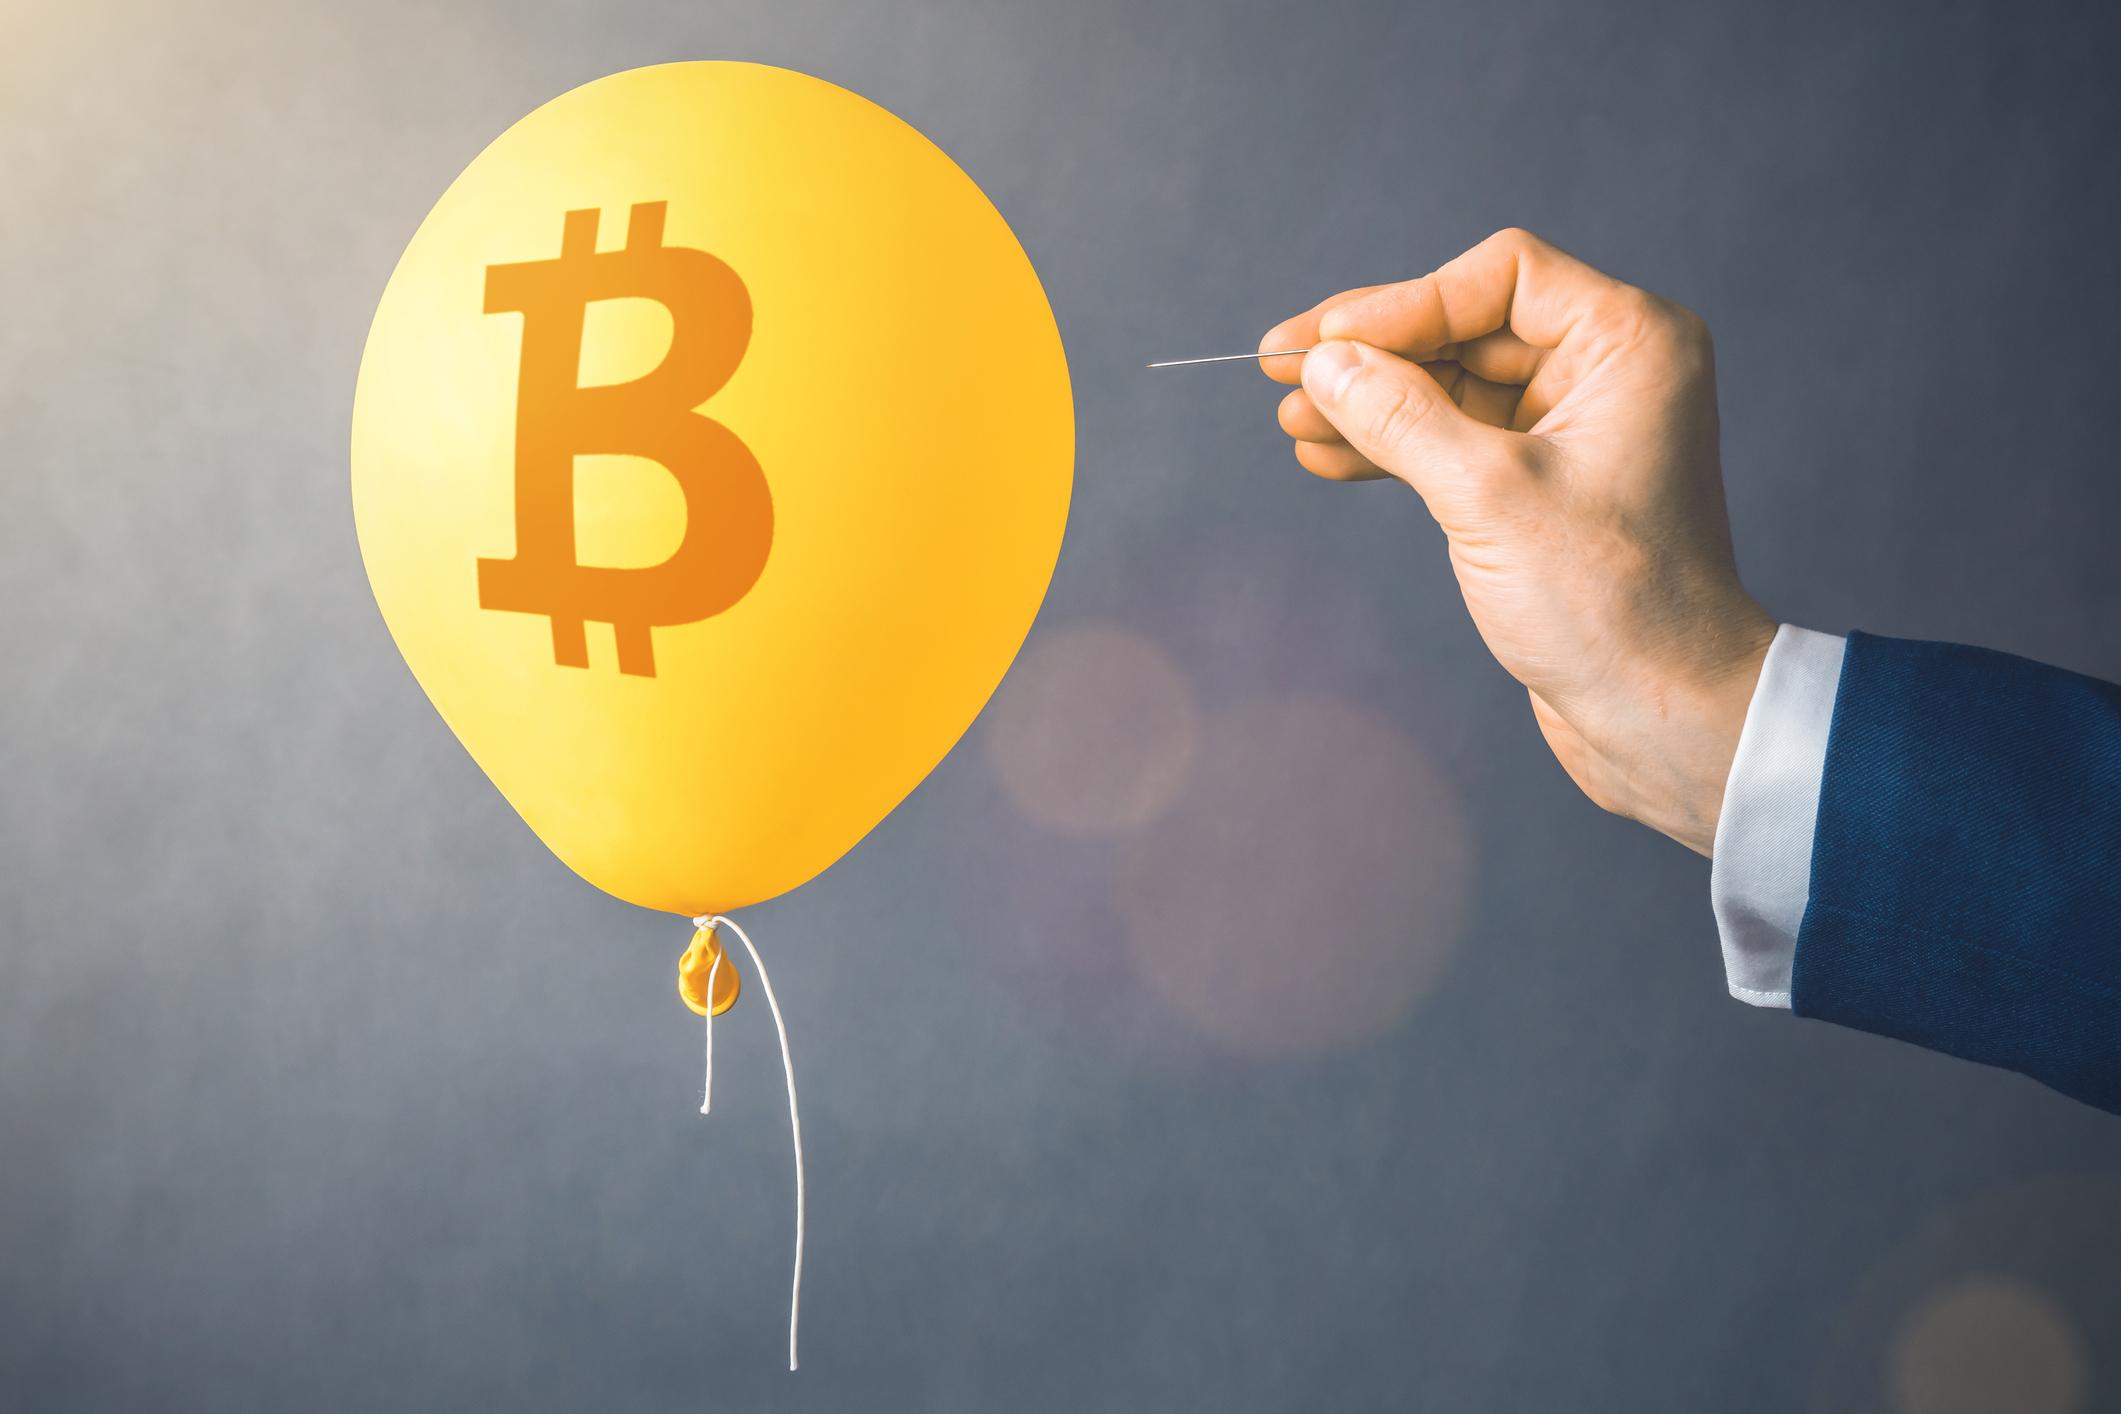 Harga Bitcoin Cenderung Tidak Stabil